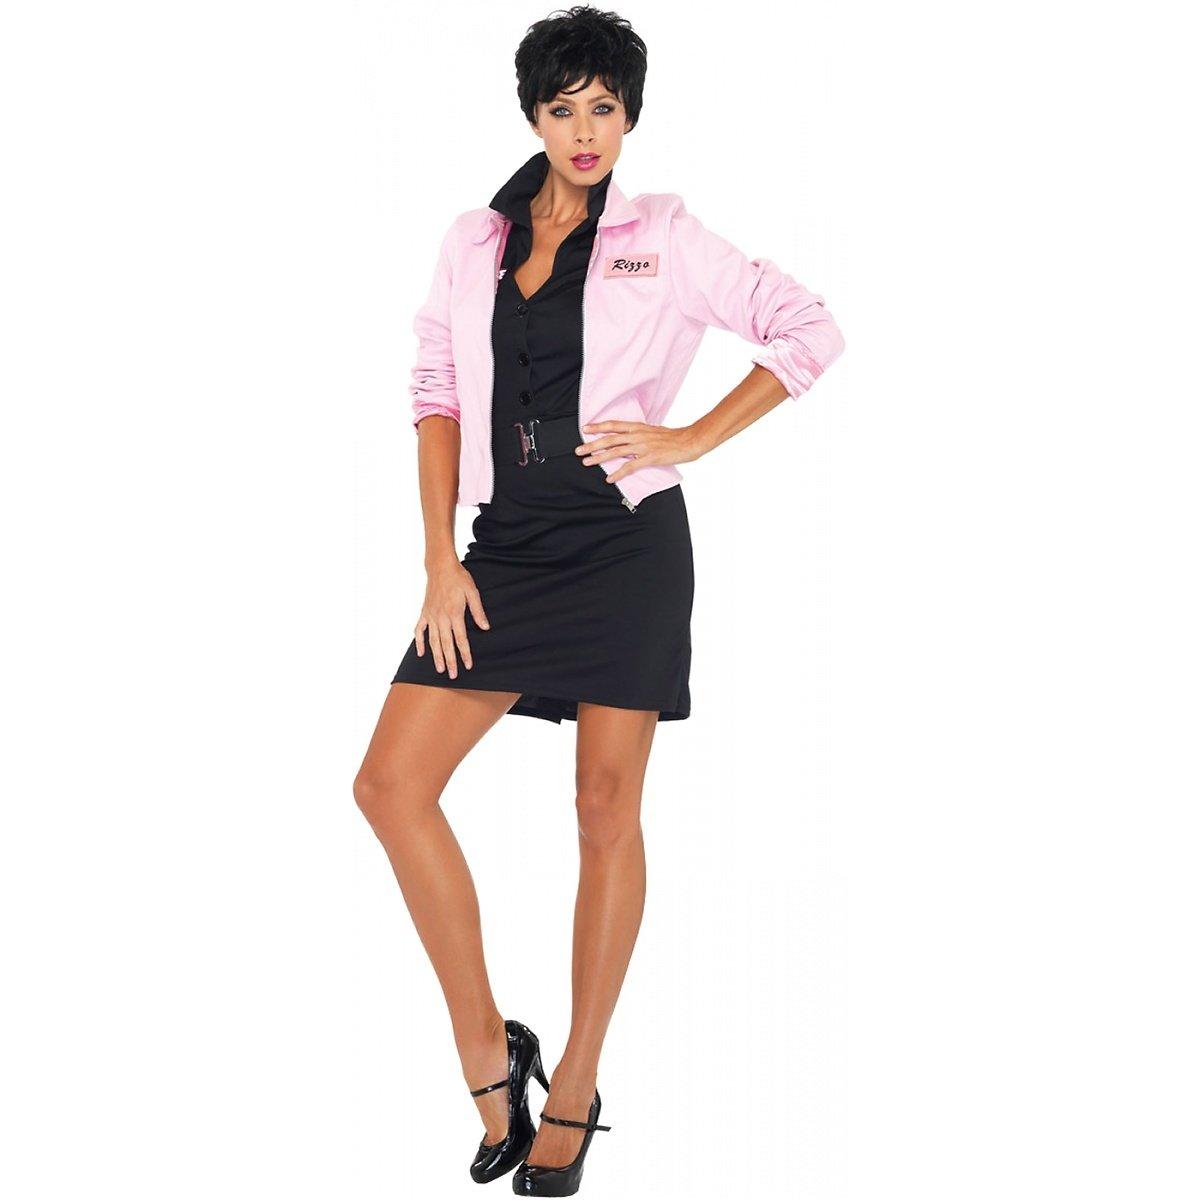 Chaqueta Leg Avenue LAGR83985-L para mujer Grease Pink ...